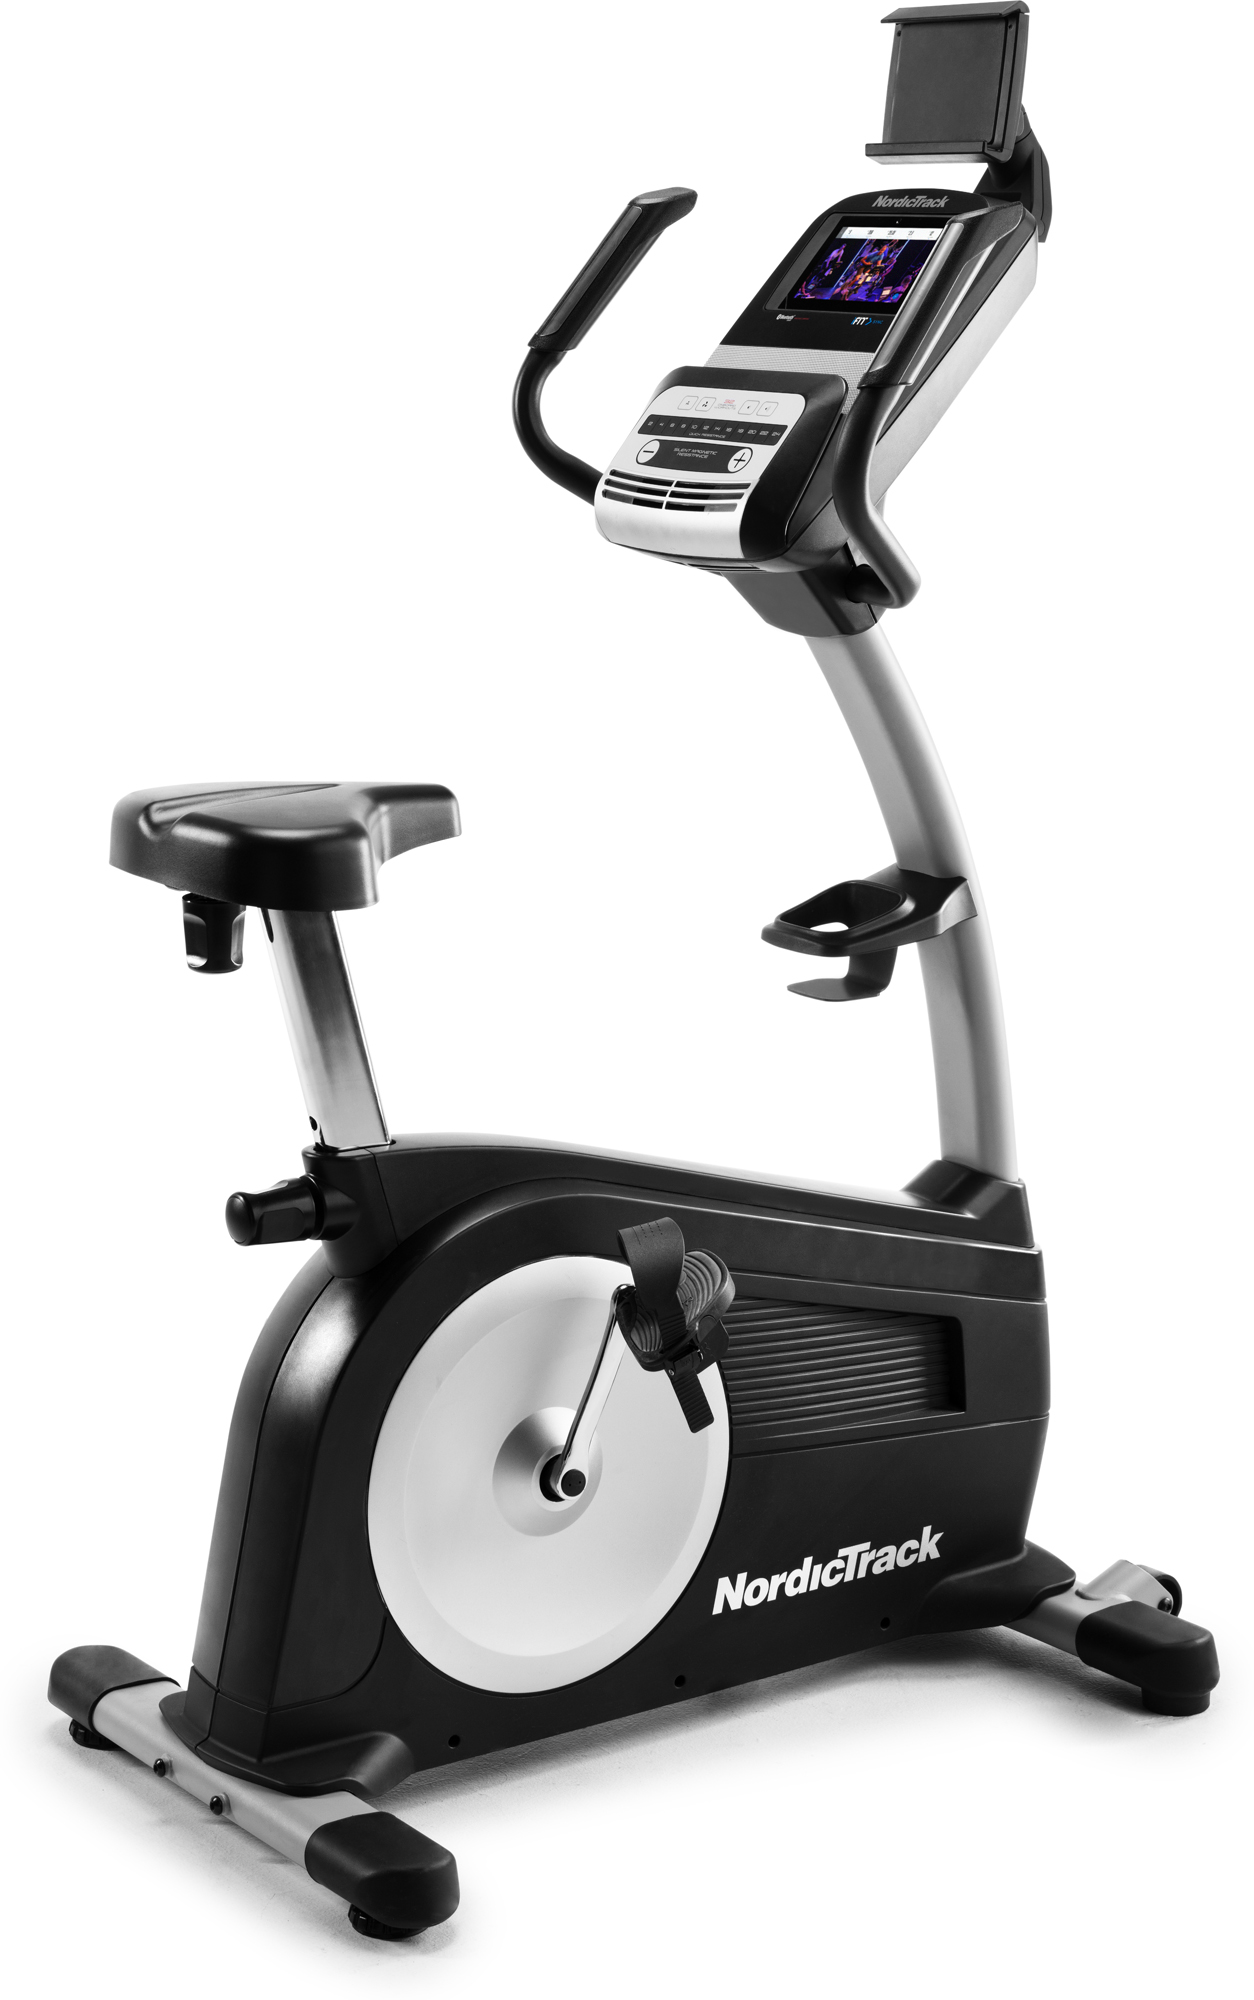 NordicTrack Велотренажер магнитный GX 4.6 Pro